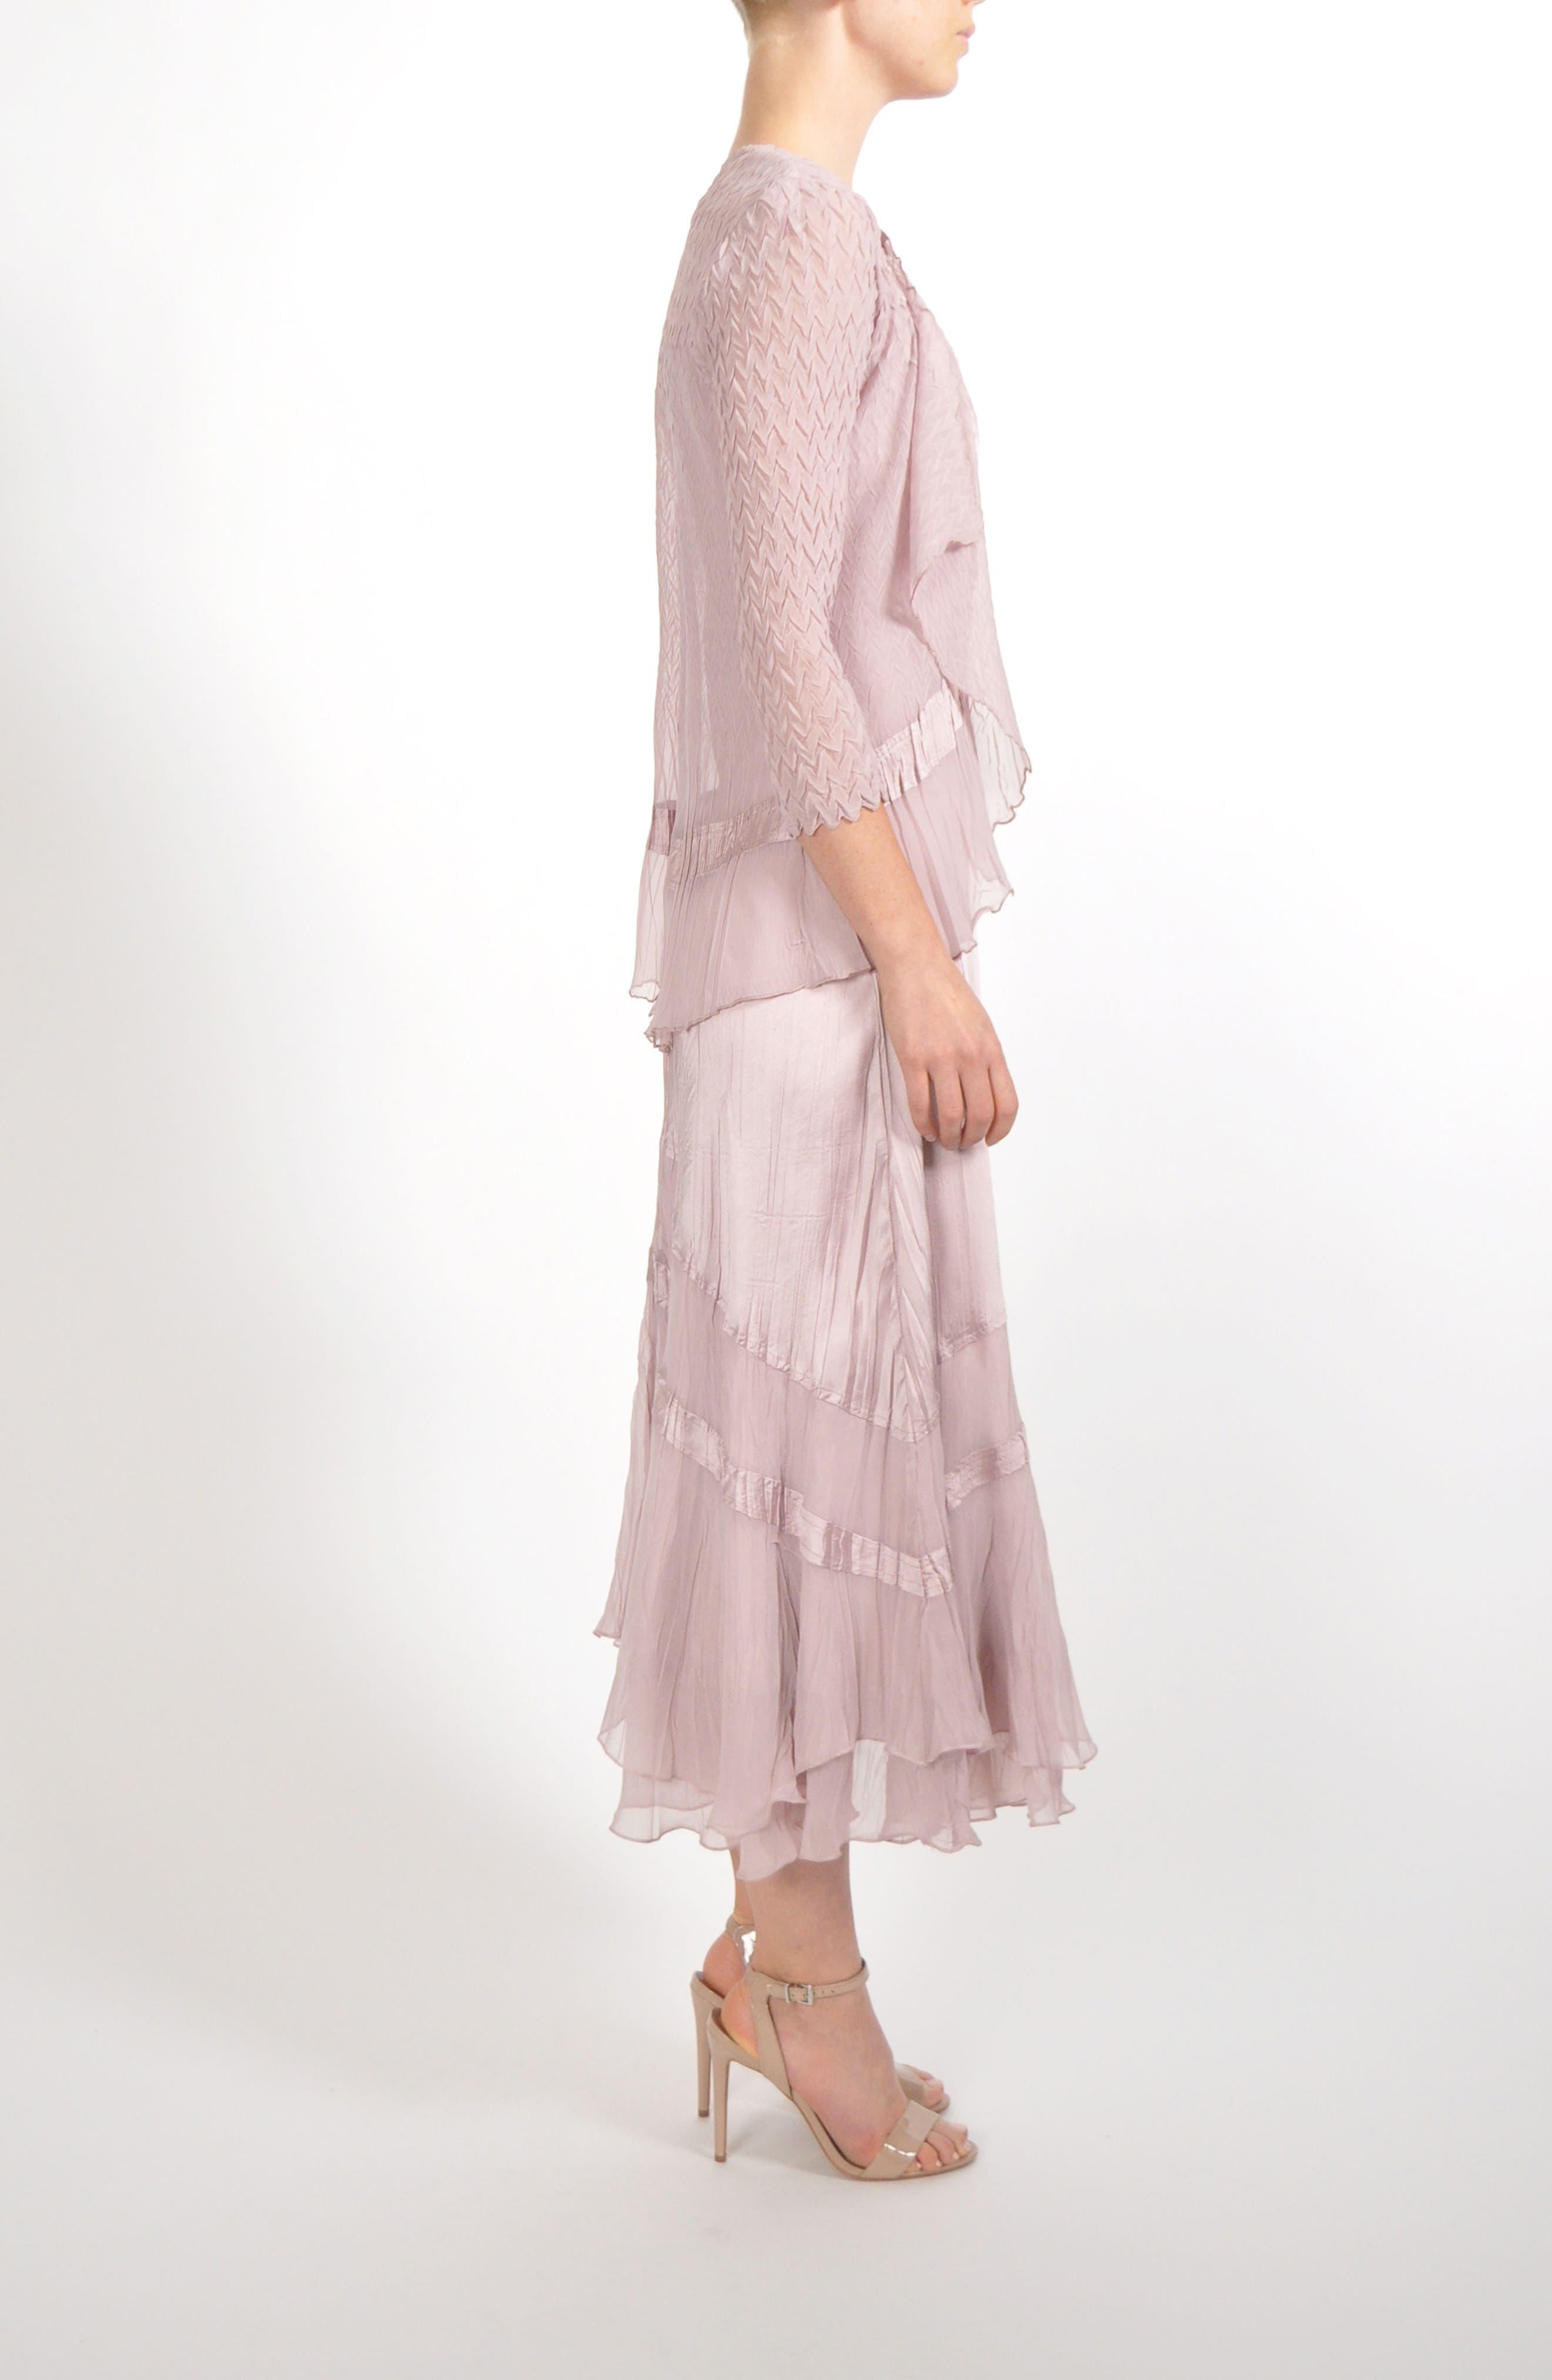 Embellished Tiered Hem Dress With Jacket,                             Alternate thumbnail 6, color,